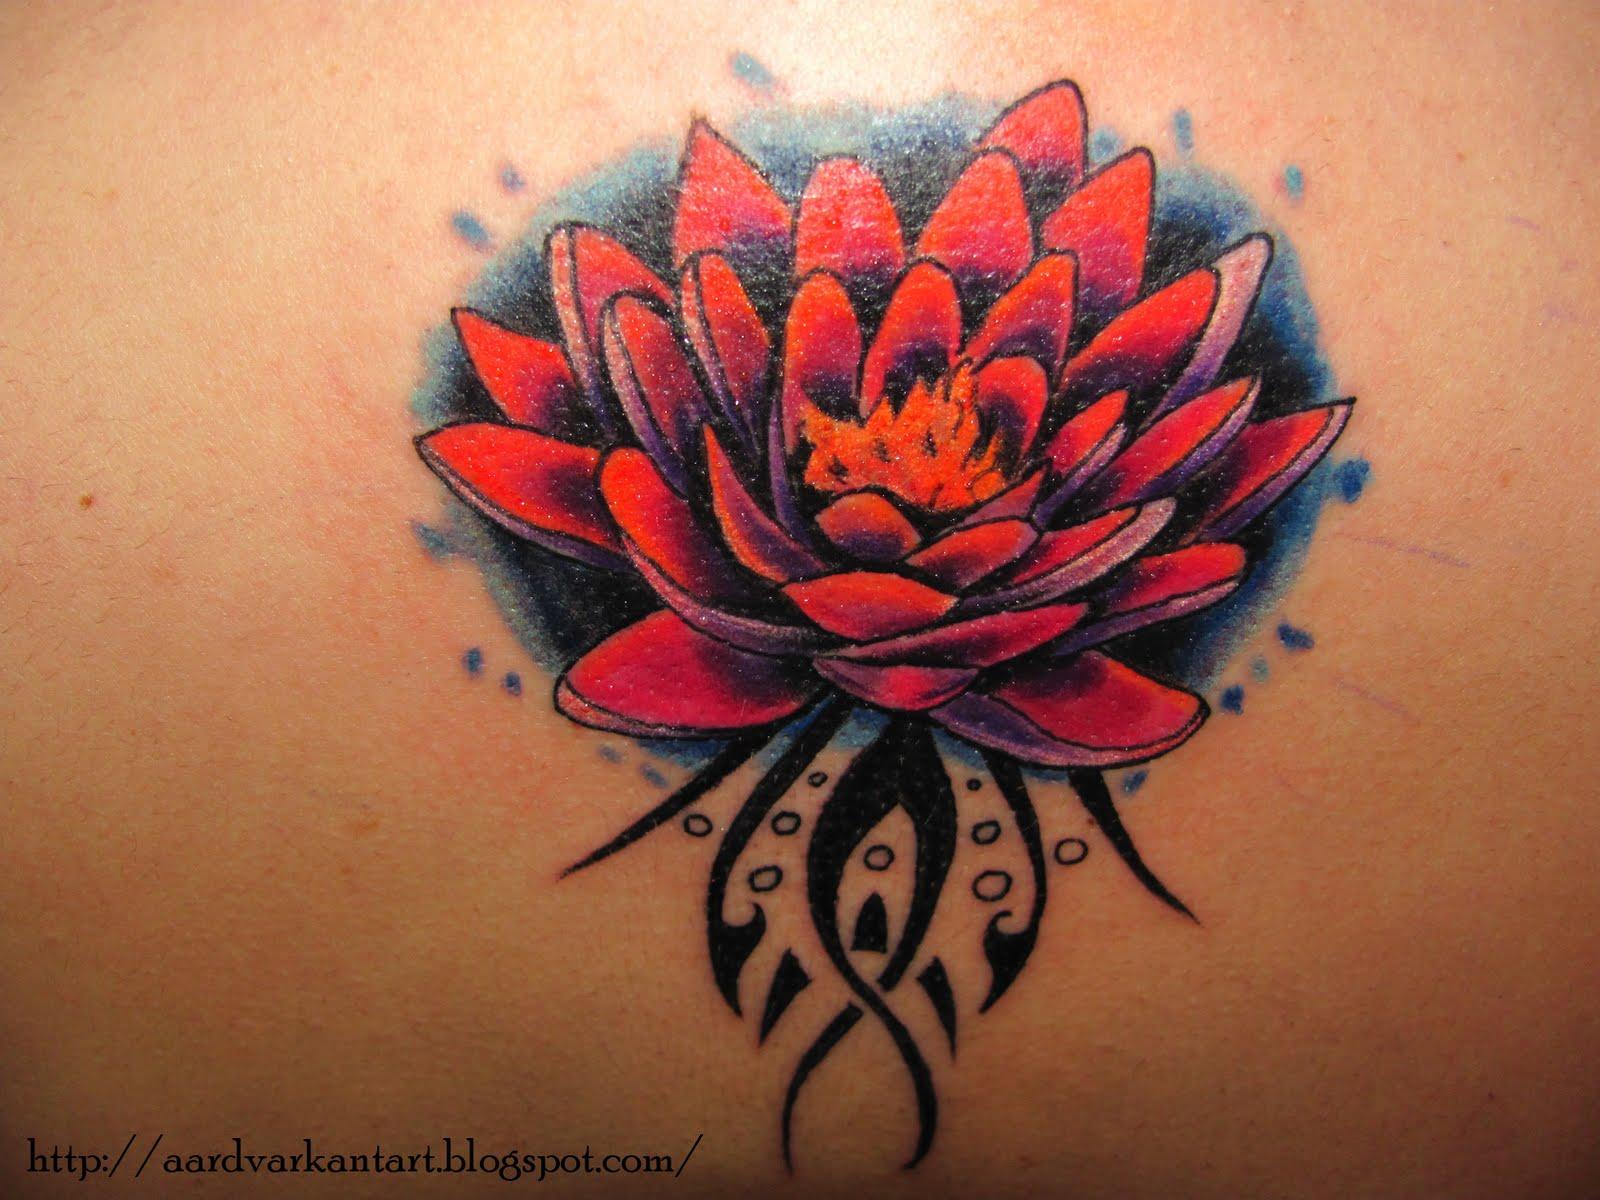 Tatouage Roses Signification - Tout savoir sur le tatouage rose ! Le Guide du Tattoo